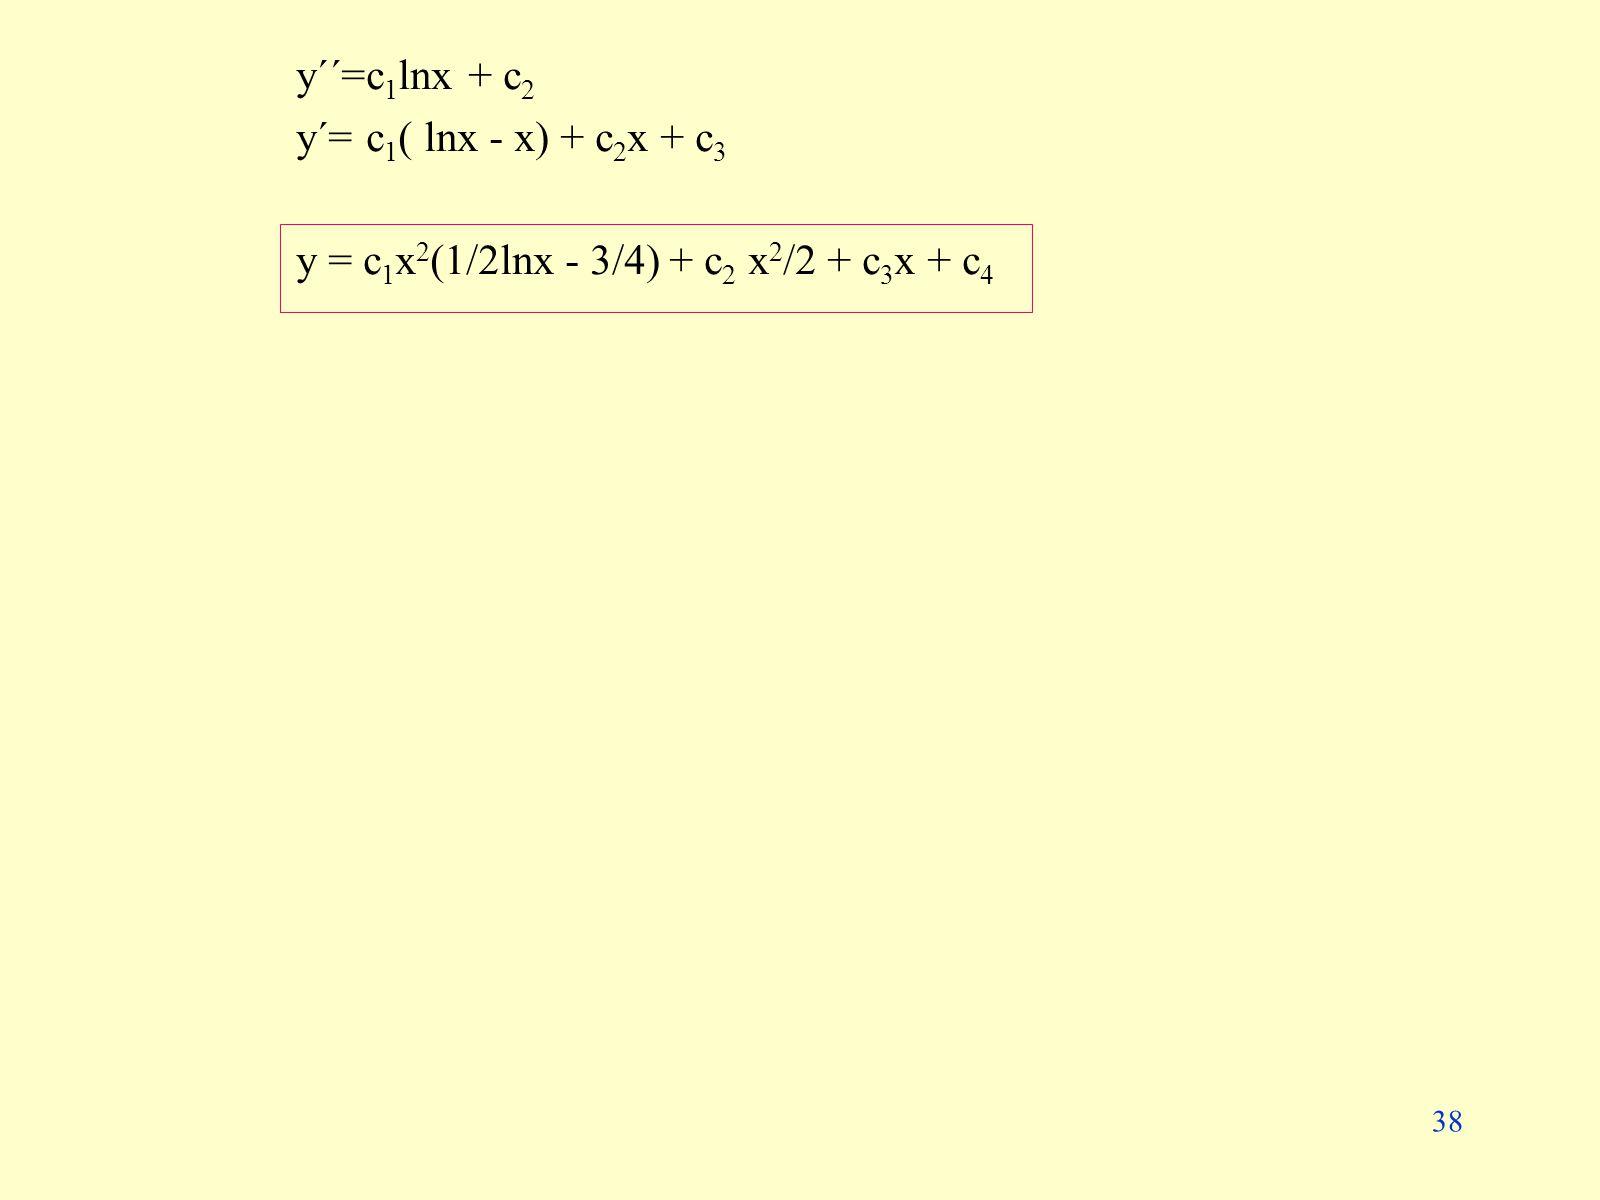 38 y´´=c 1 lnx + c 2 y´= c 1 ( lnx - x) + c 2 x + c 3 y = c 1 x 2 (1/2lnx - 3/4) + c 2 x 2 /2 + c 3 x + c 4